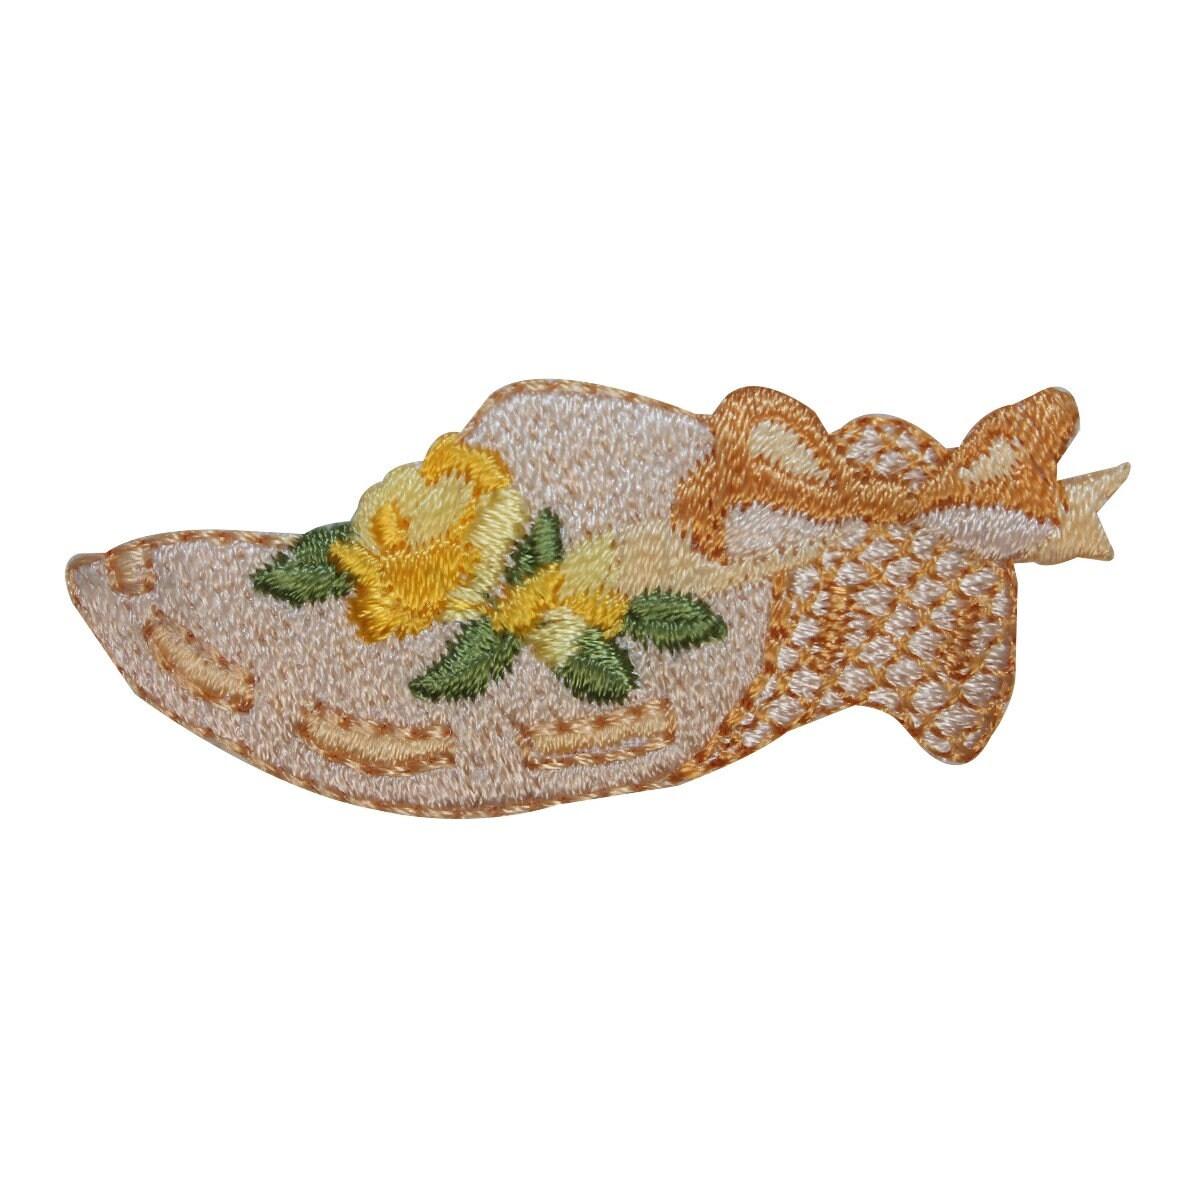 eda50895922 ID 8482 Floral Wicker Sun Hat Patch Garden Club Cap